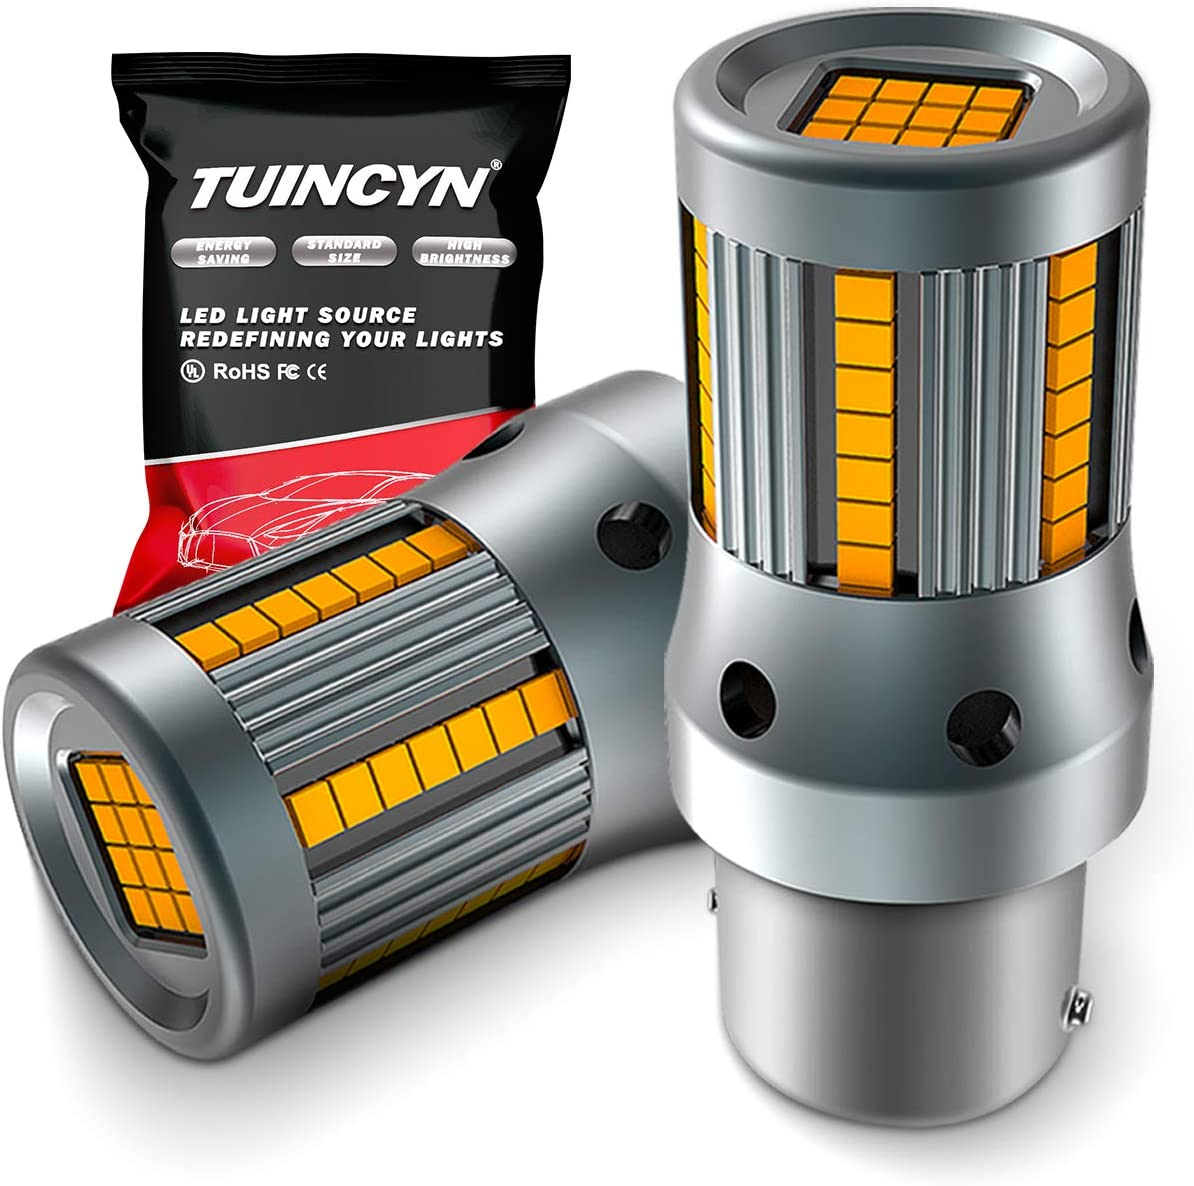 TUINCYN Seasonal Max 85% OFF Wrap Introduction 1156 LED Bulb Amber Anti Free Turn CANBUS Si Flash Hyper